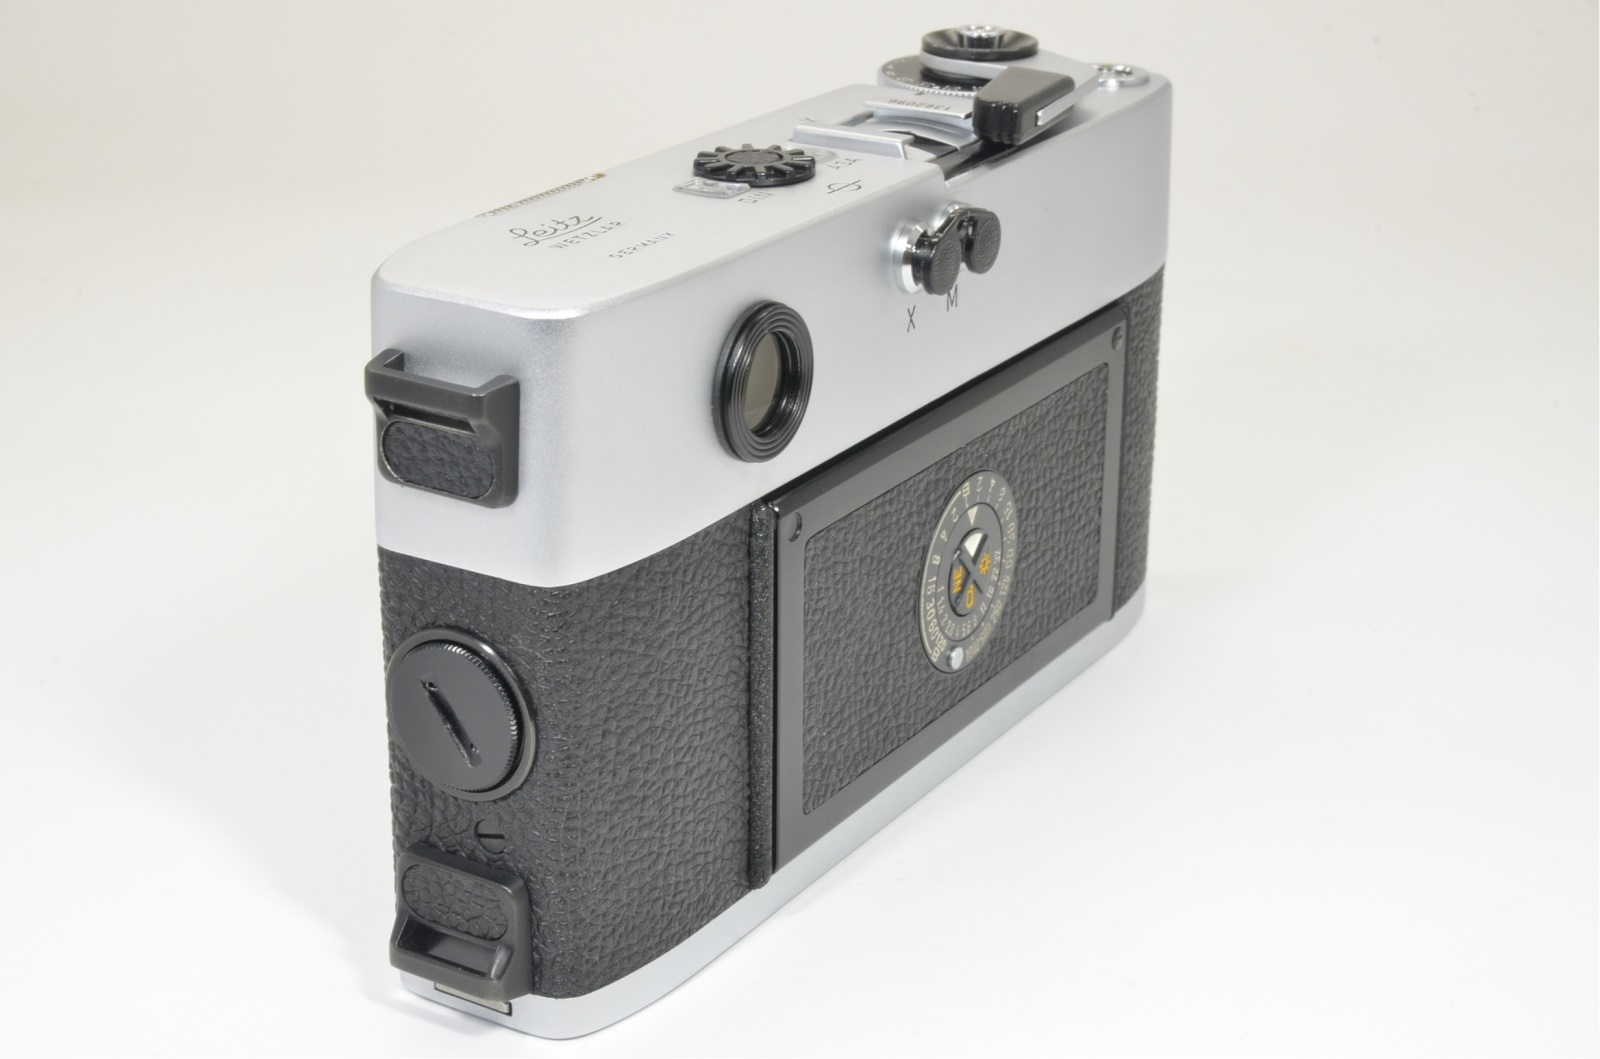 leica m5 silver chrome 3 lug s/n 1362096 year 1973 shooting tested